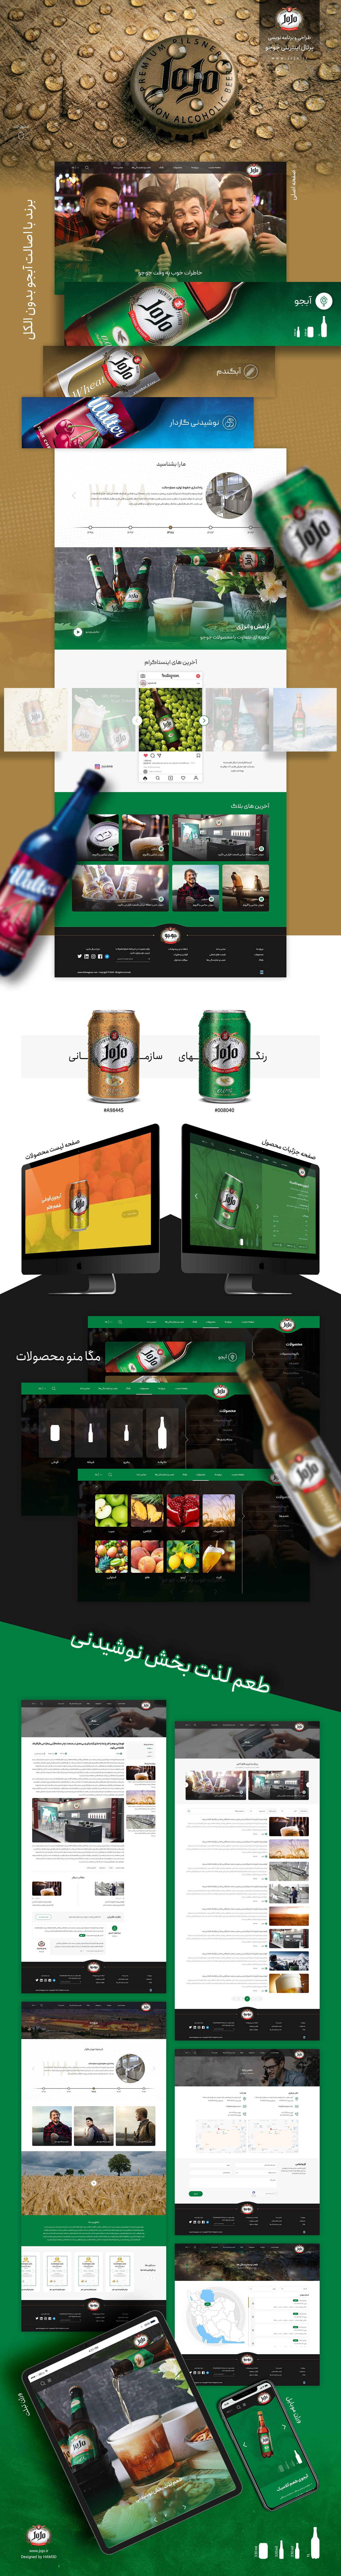 پرتال اینترنتی شرکت تهران گوار جوجو